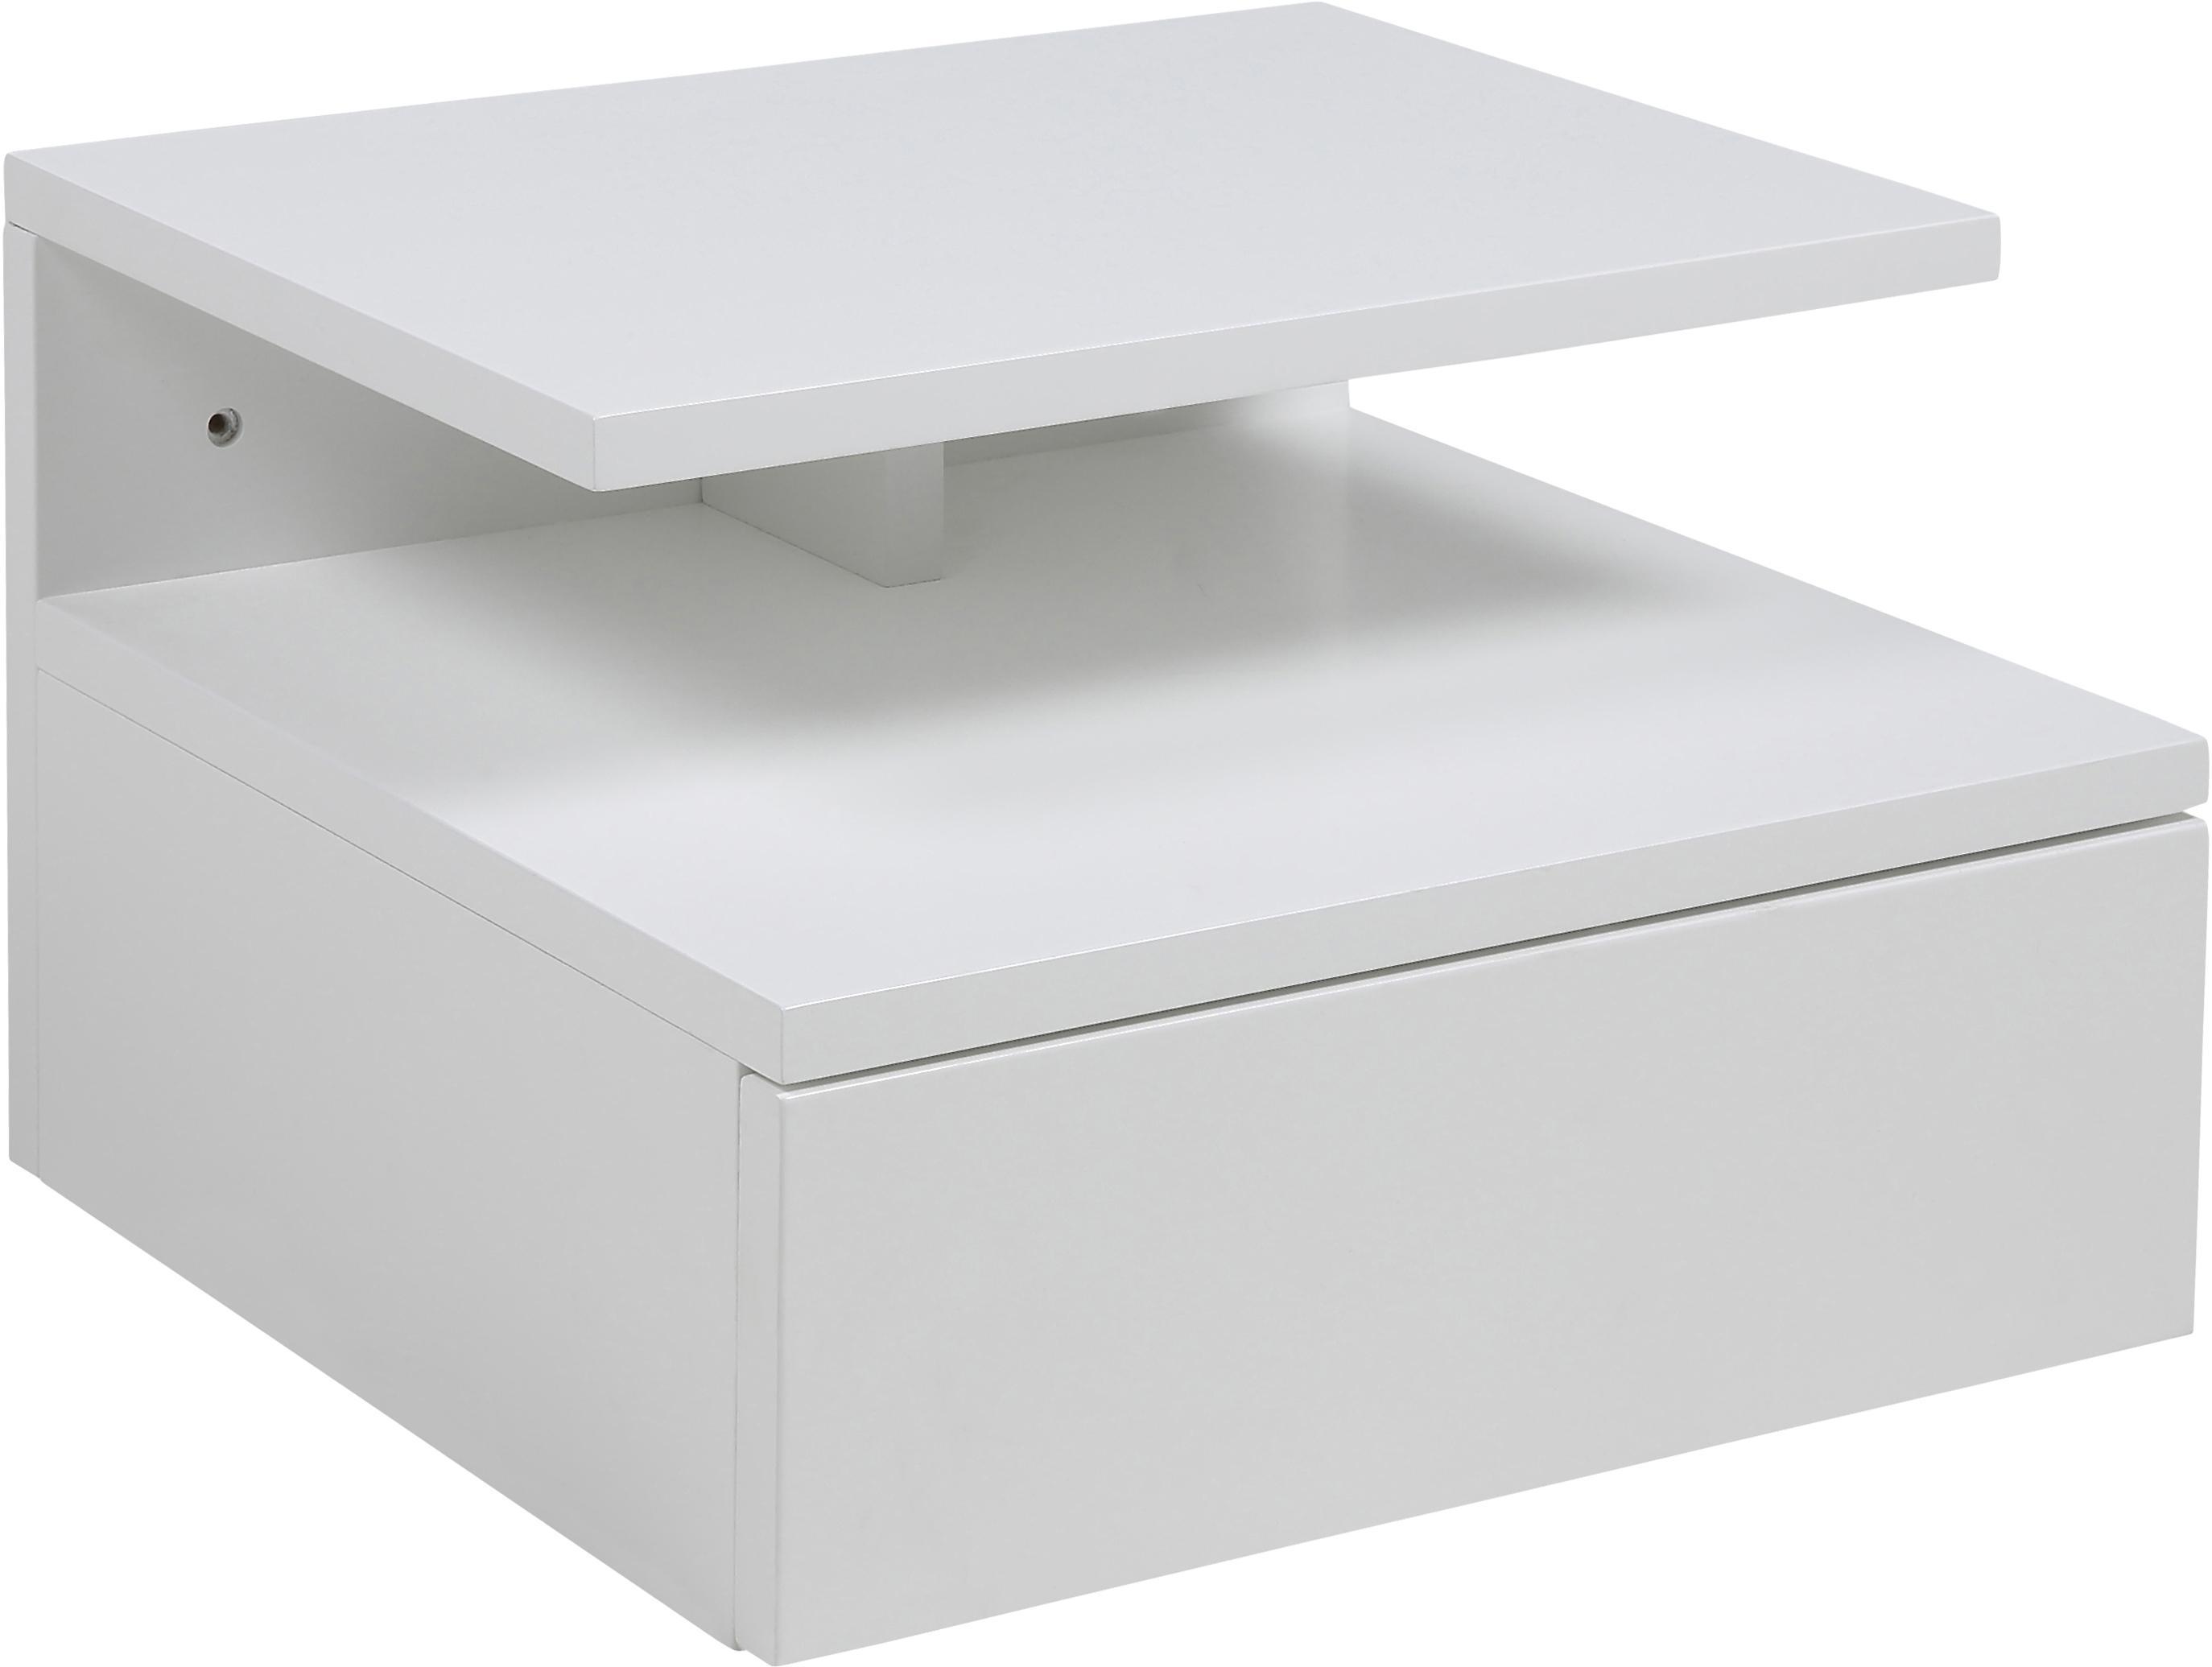 Wandnachtkastje Ashlan met laden, Gelakt MDF, Mat wit, 35 x 23 cm